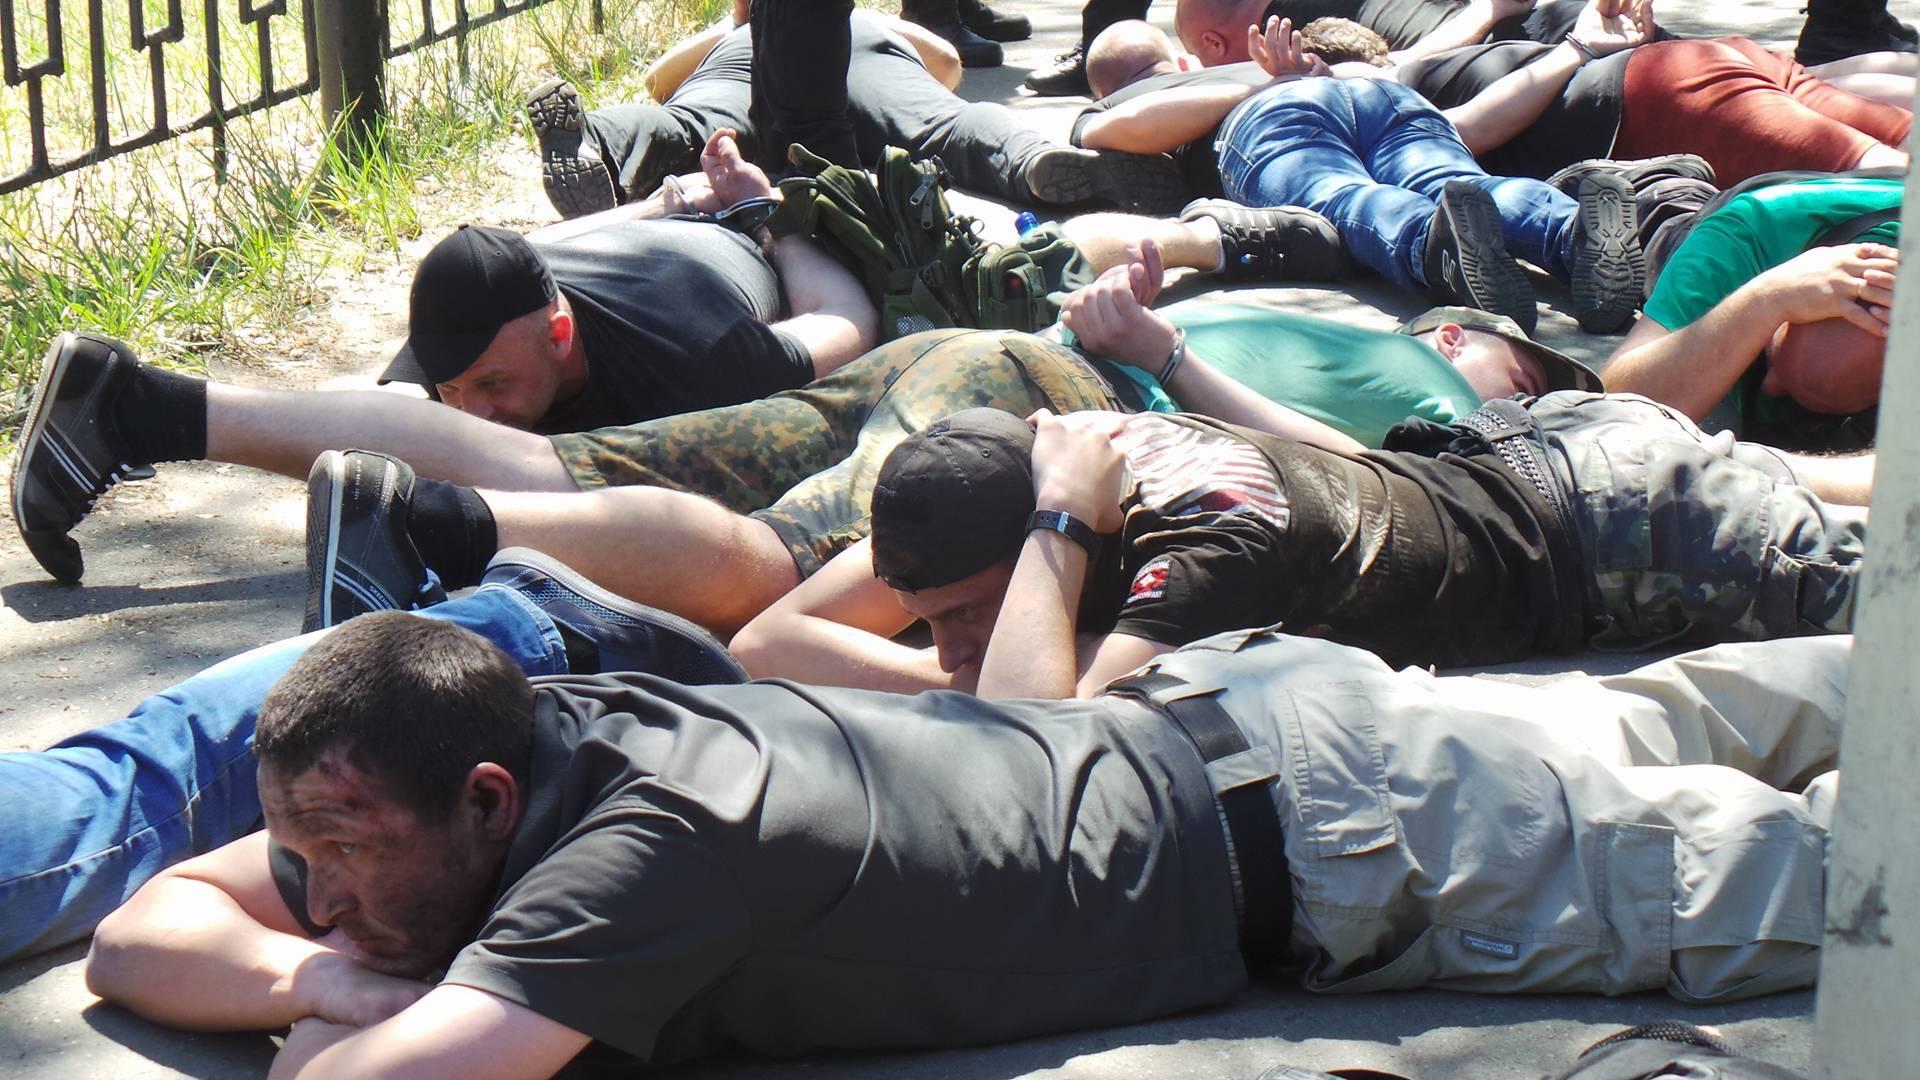 Полиция задержала 34 нападавших